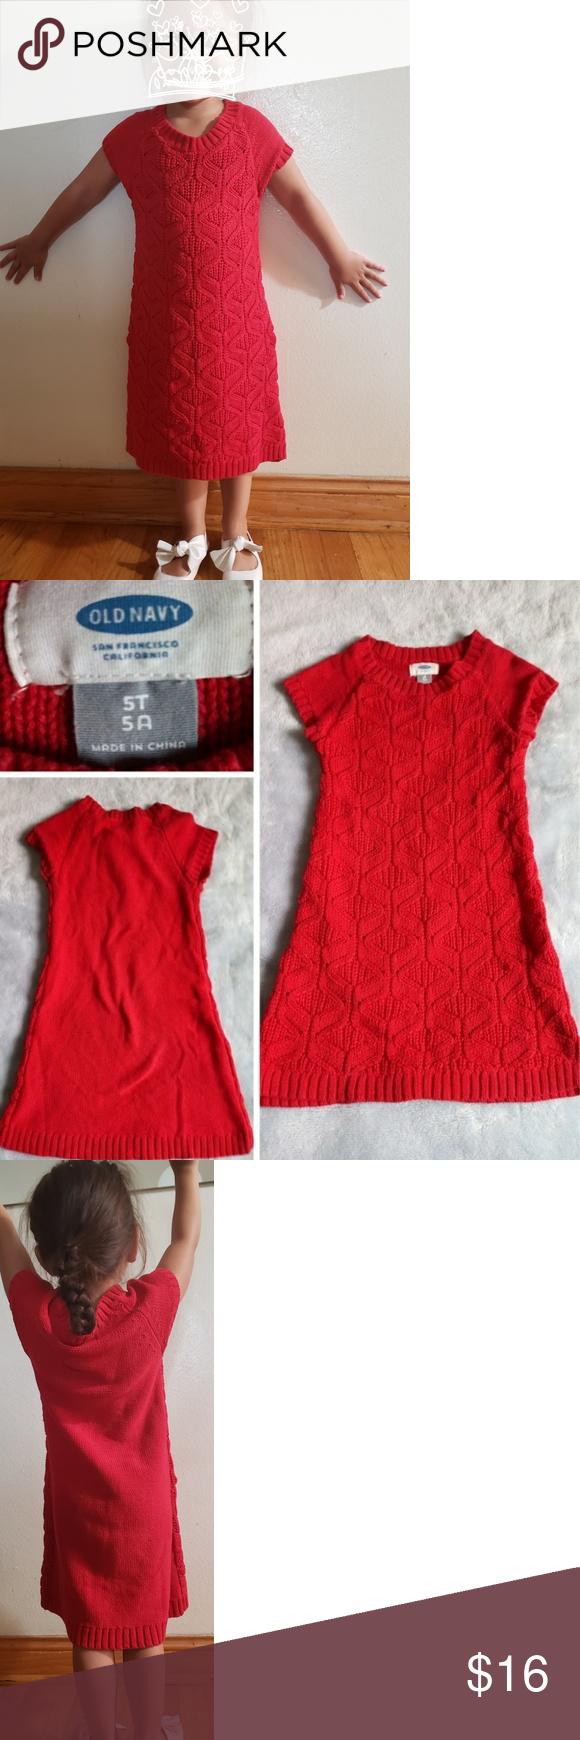 Oldnavy Sweater Dress In 2021 Girl Red Dress Toddler Sweater Sweater Dress [ 1740 x 580 Pixel ]